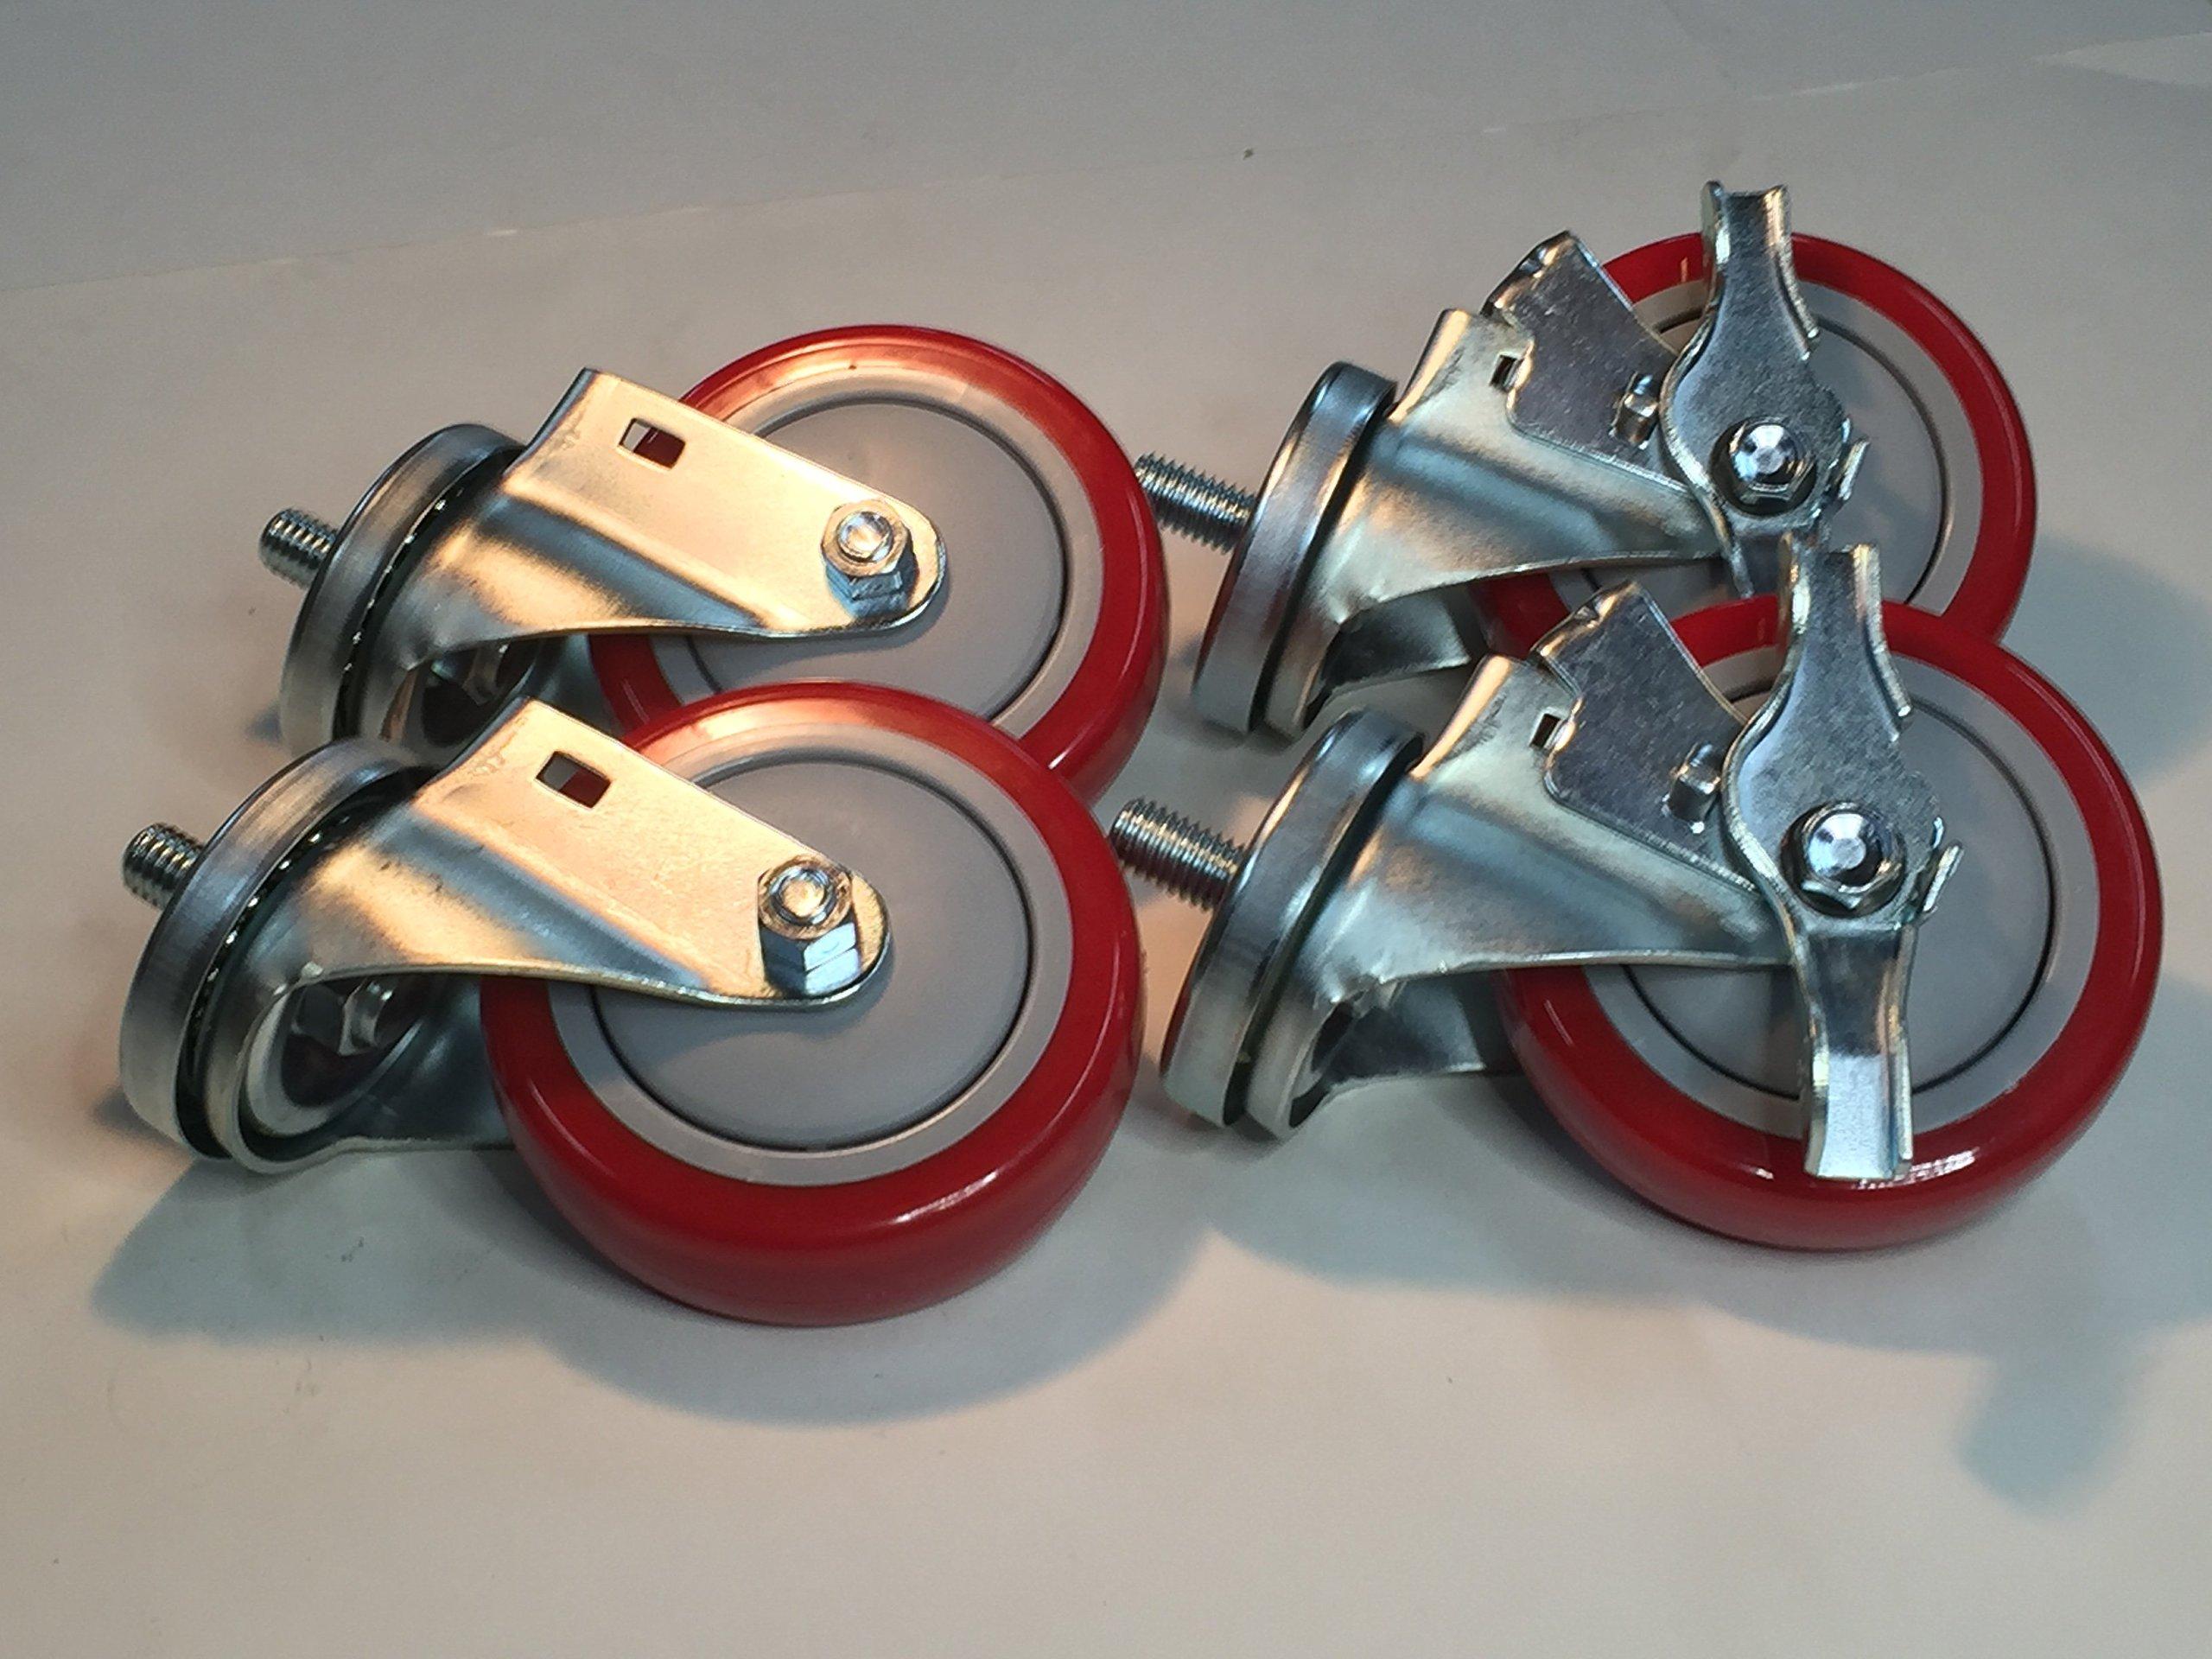 Transmission Jack Casters, Set of 4, (2 Locking and 2 Non Locking)